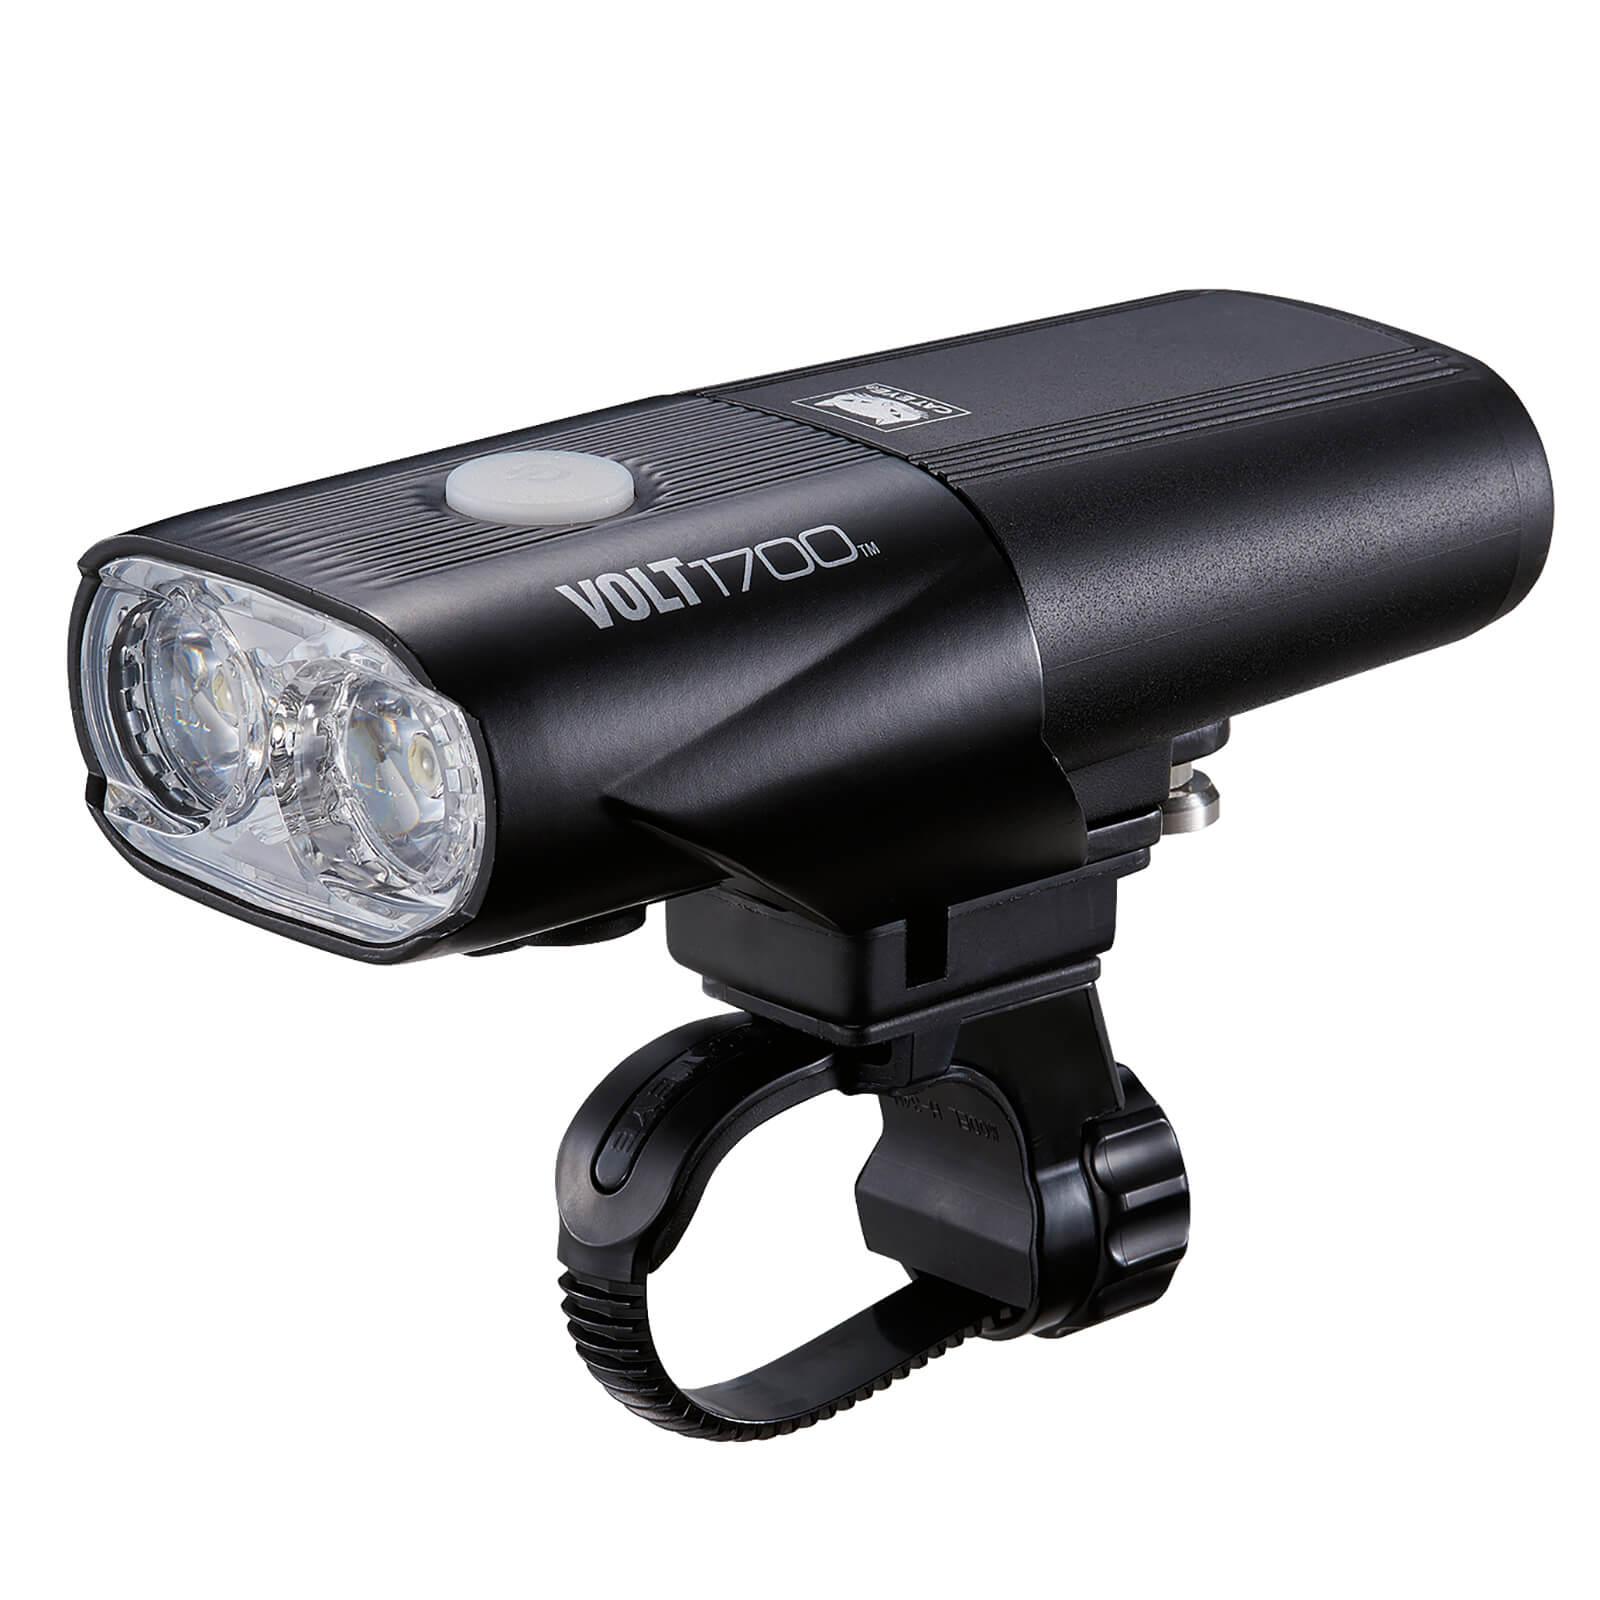 Cateye Volt 1700 USB Front Light